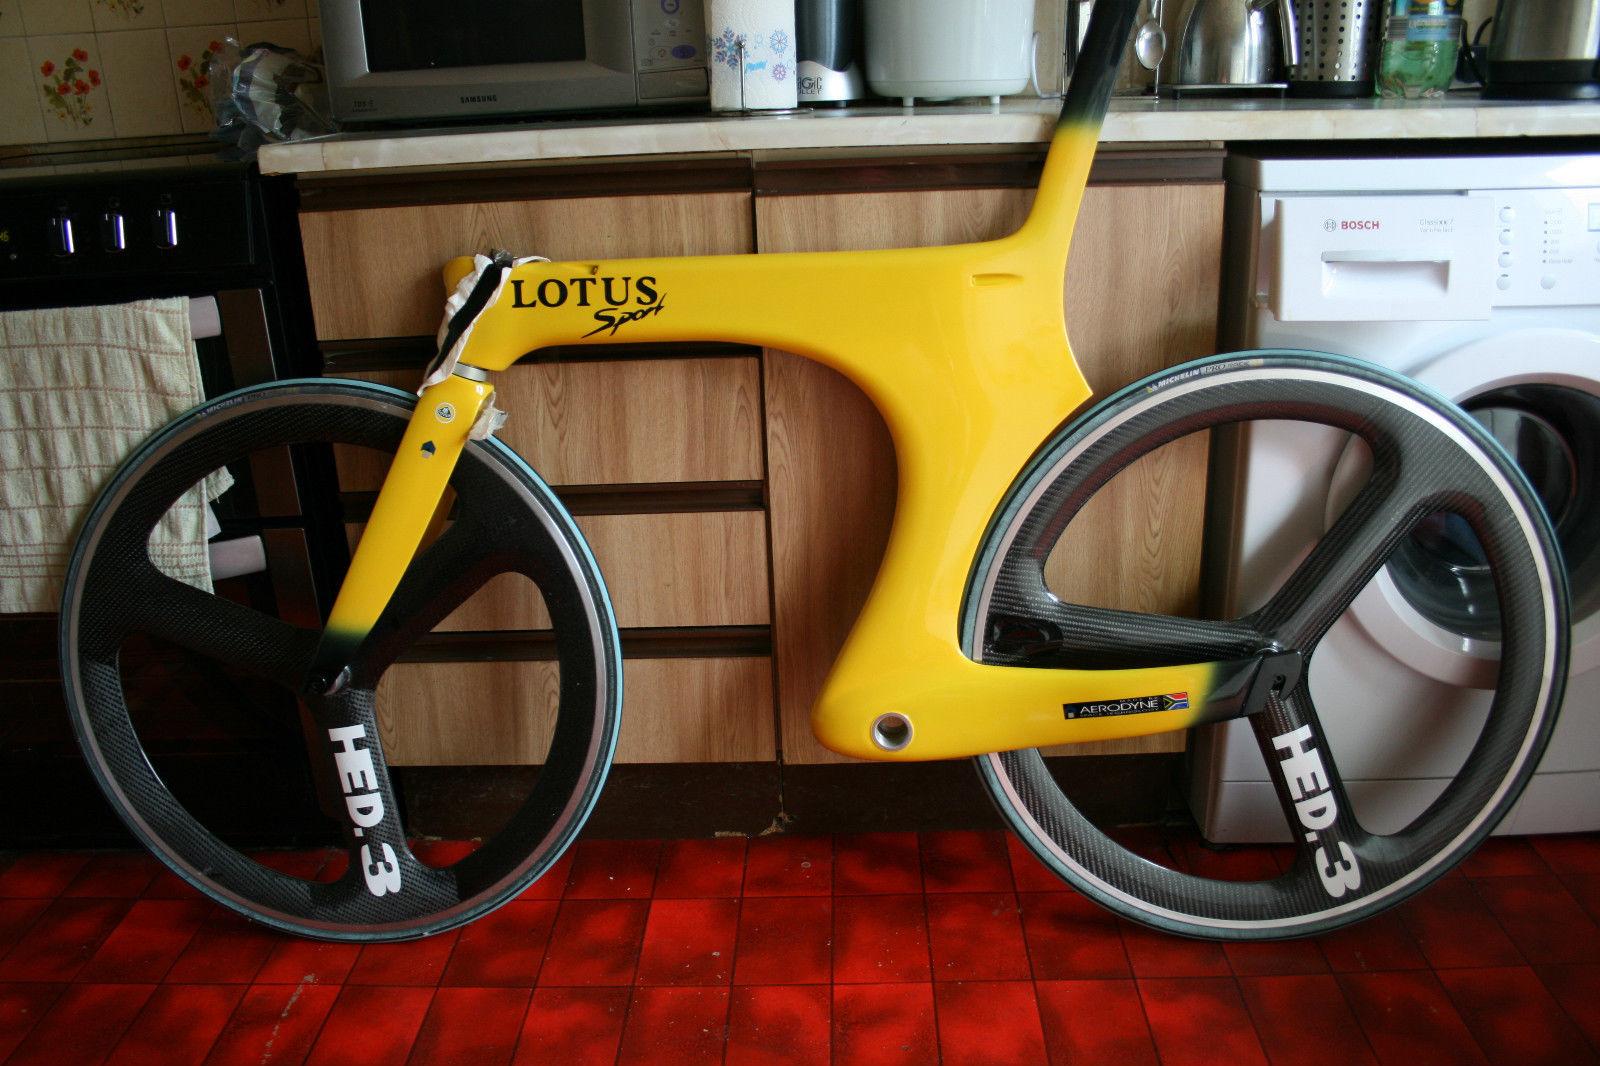 Carbon Fiber Frame Bikes For Sale Ebay >> 8 000 Lotus Sport 110 For Sale On Ebay Road Cc